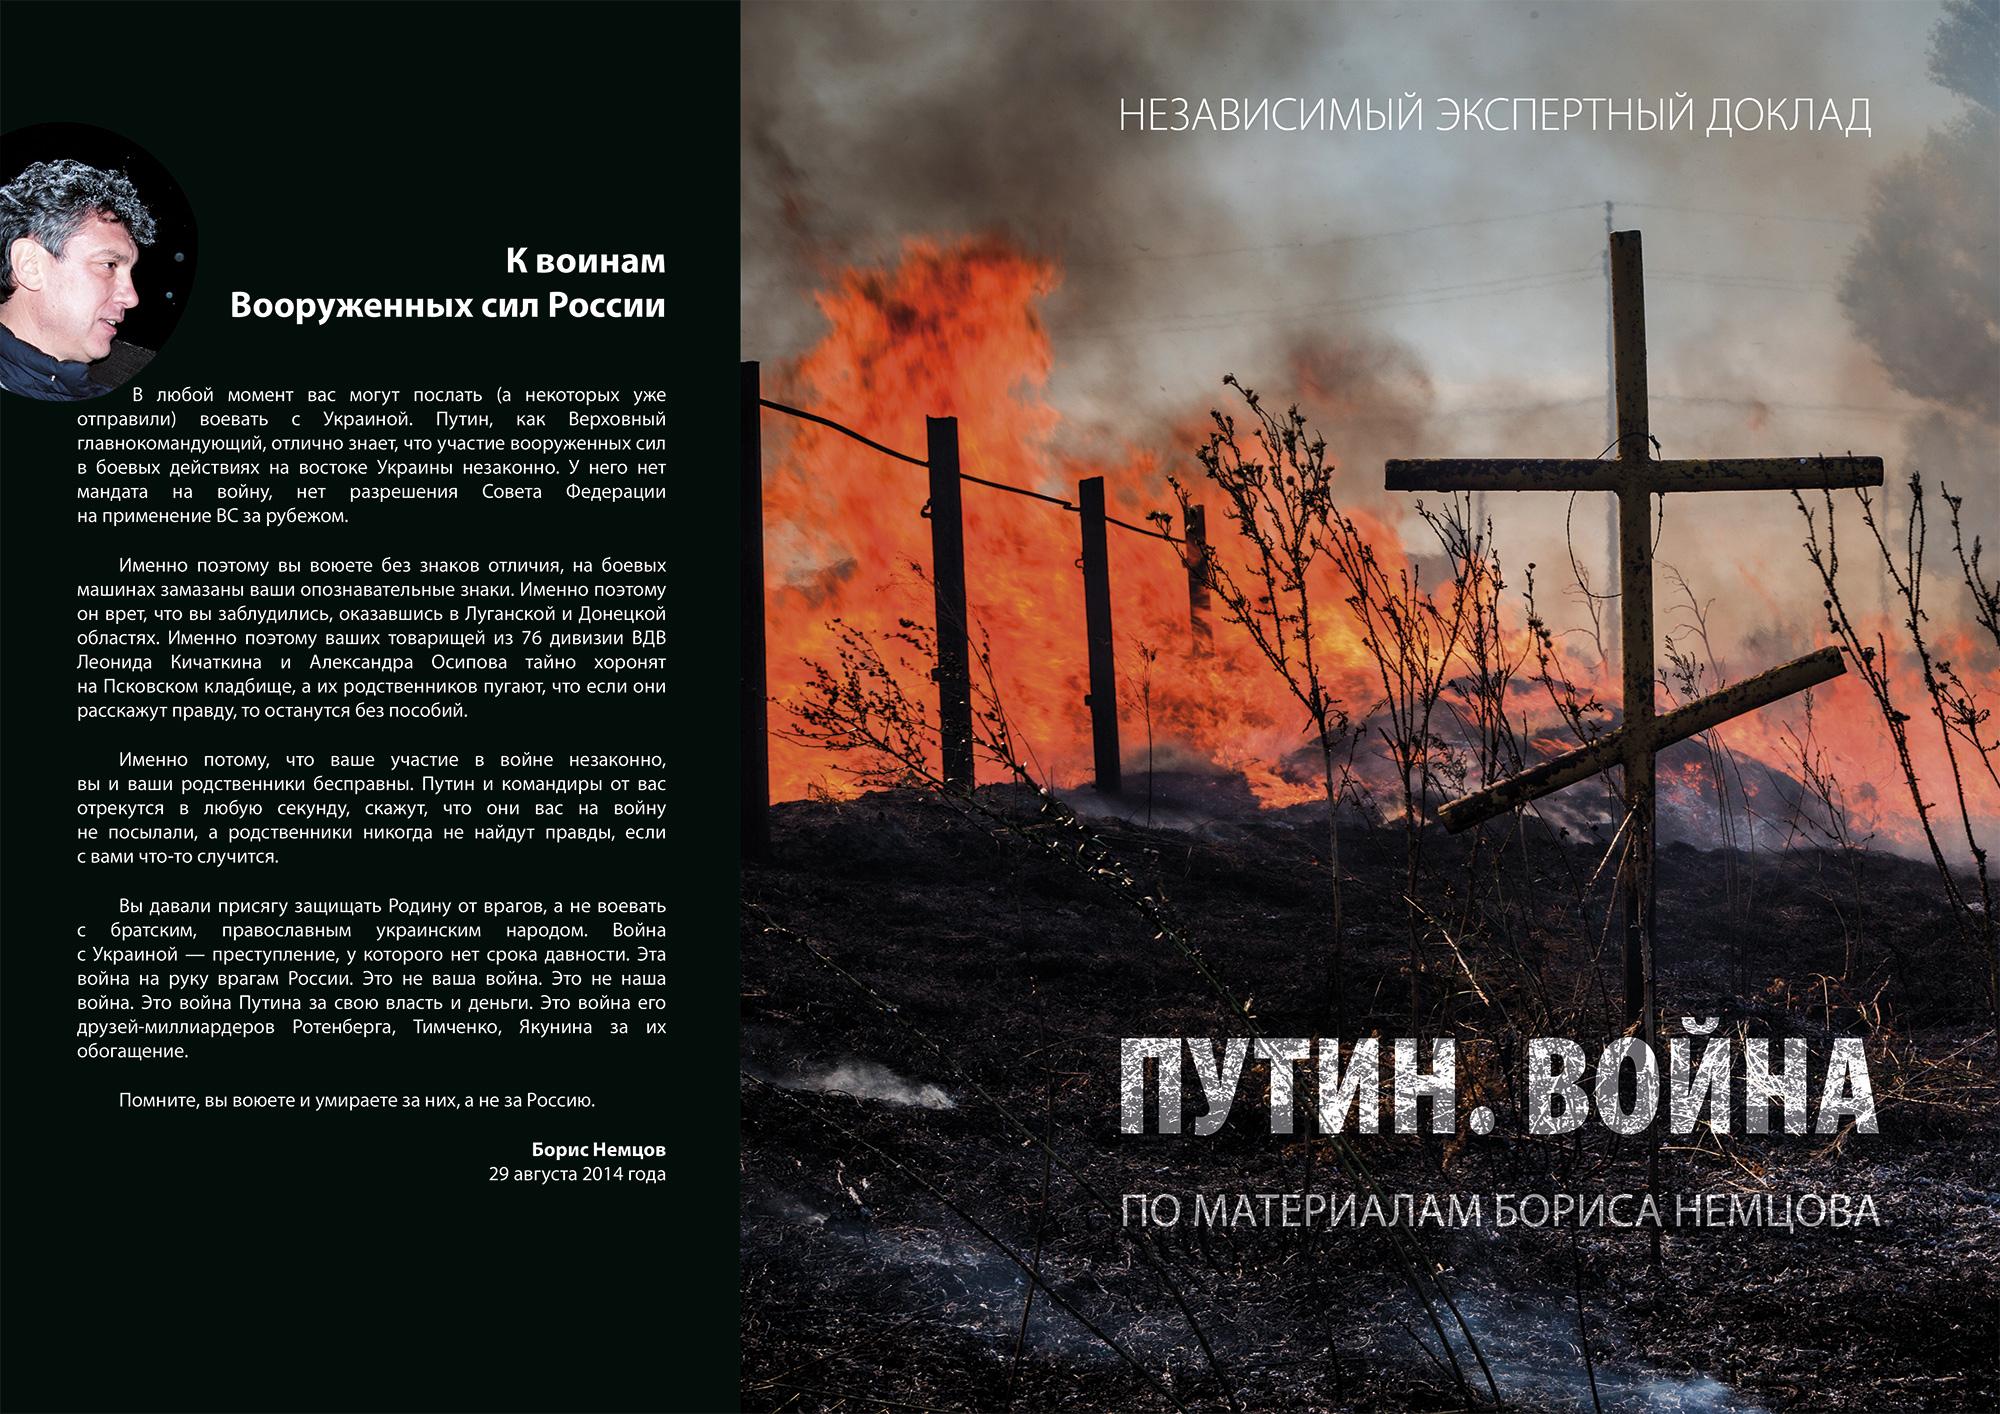 5b72ce8b2596 Файл Putin.Voina .Cover .FULL .jpg — Википедия